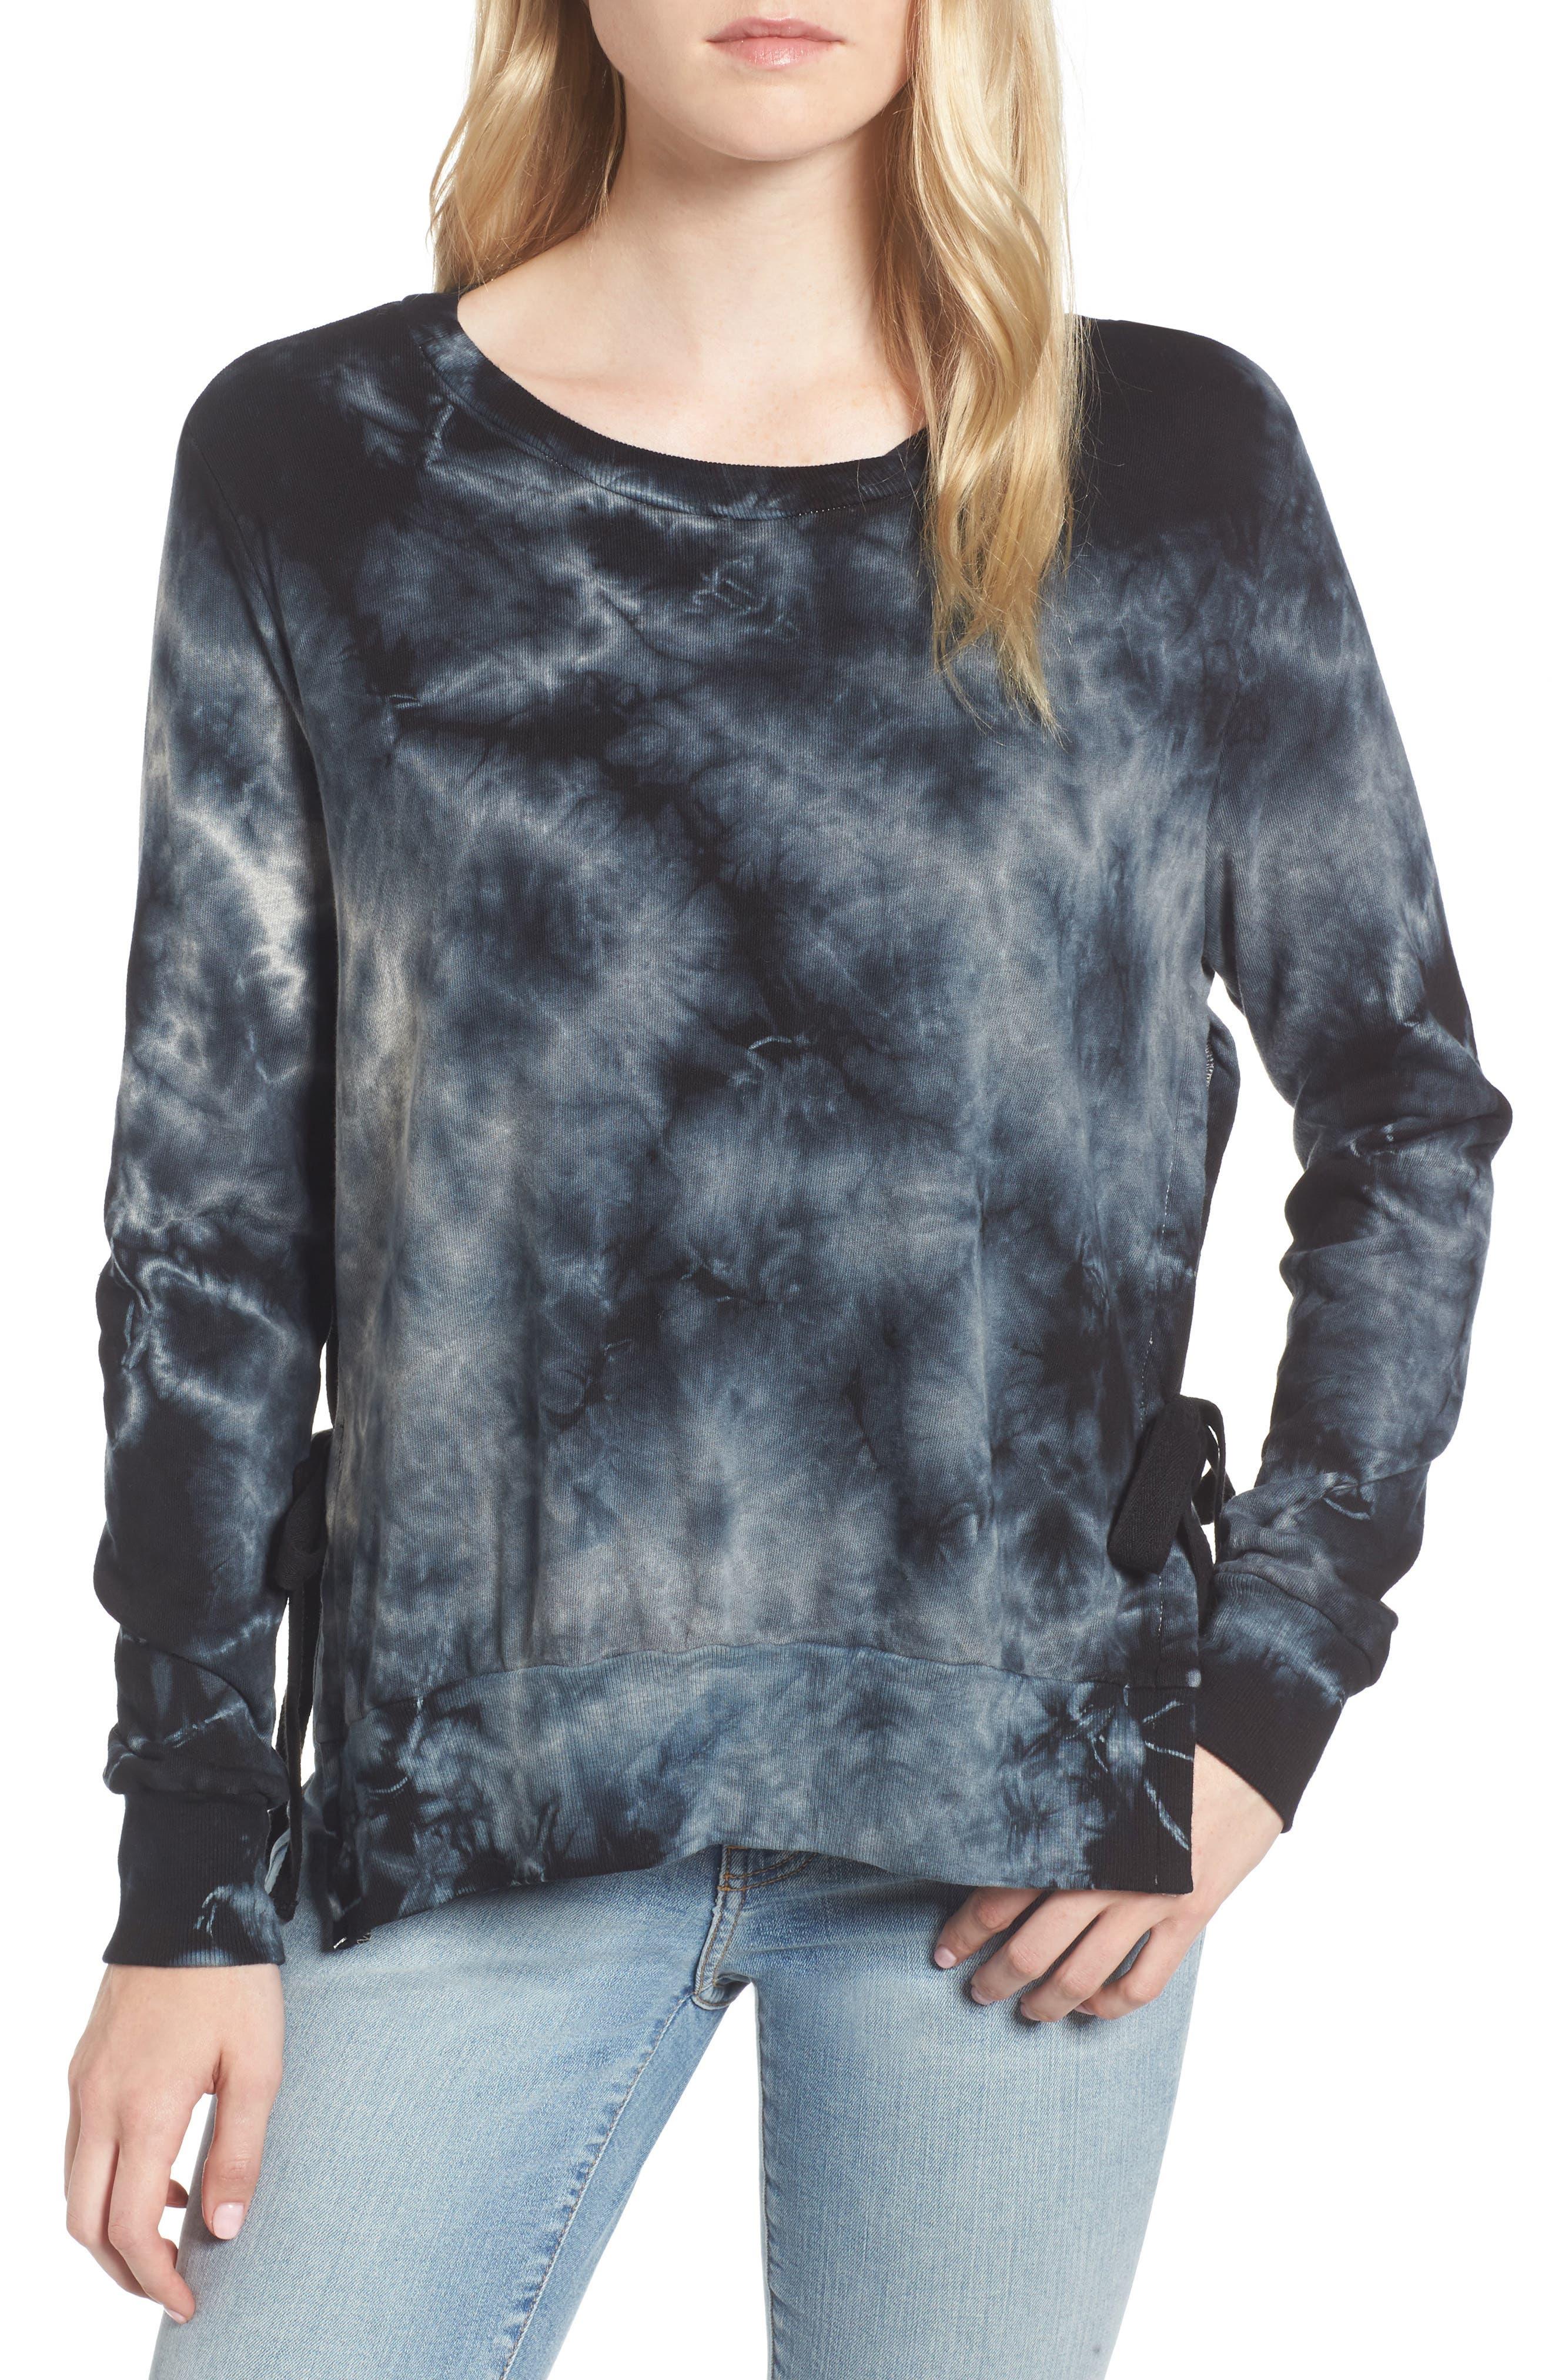 Tie Dye Sweatshirt,                         Main,                         color, Black/ Heather Grey Tie Dye